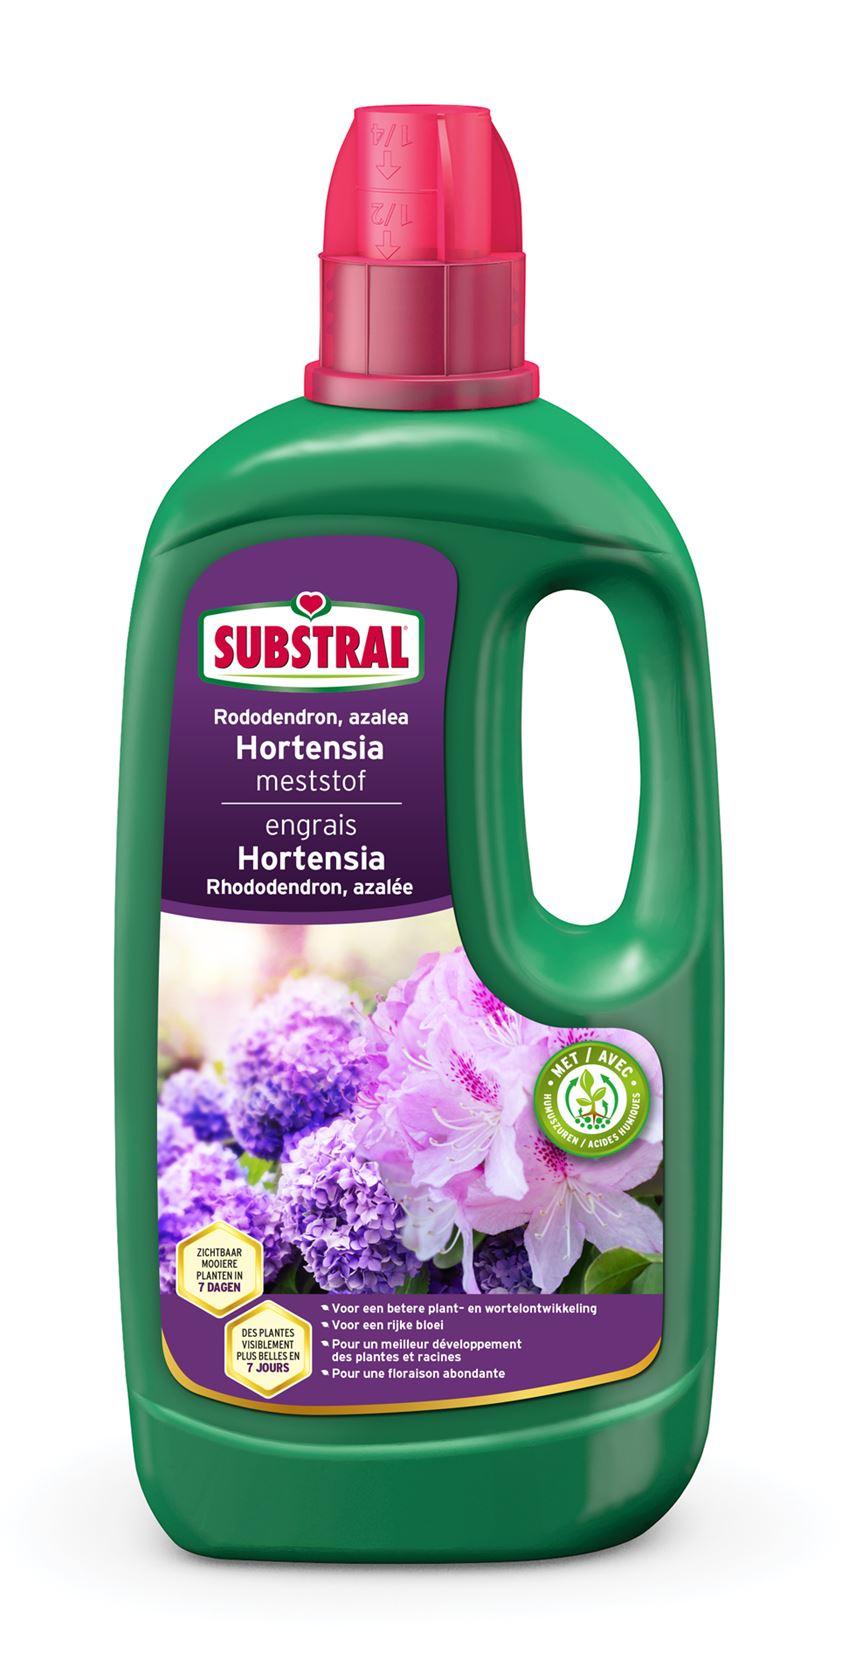 Substral-Hortensia-Rododendron-Azaleameststof-1L